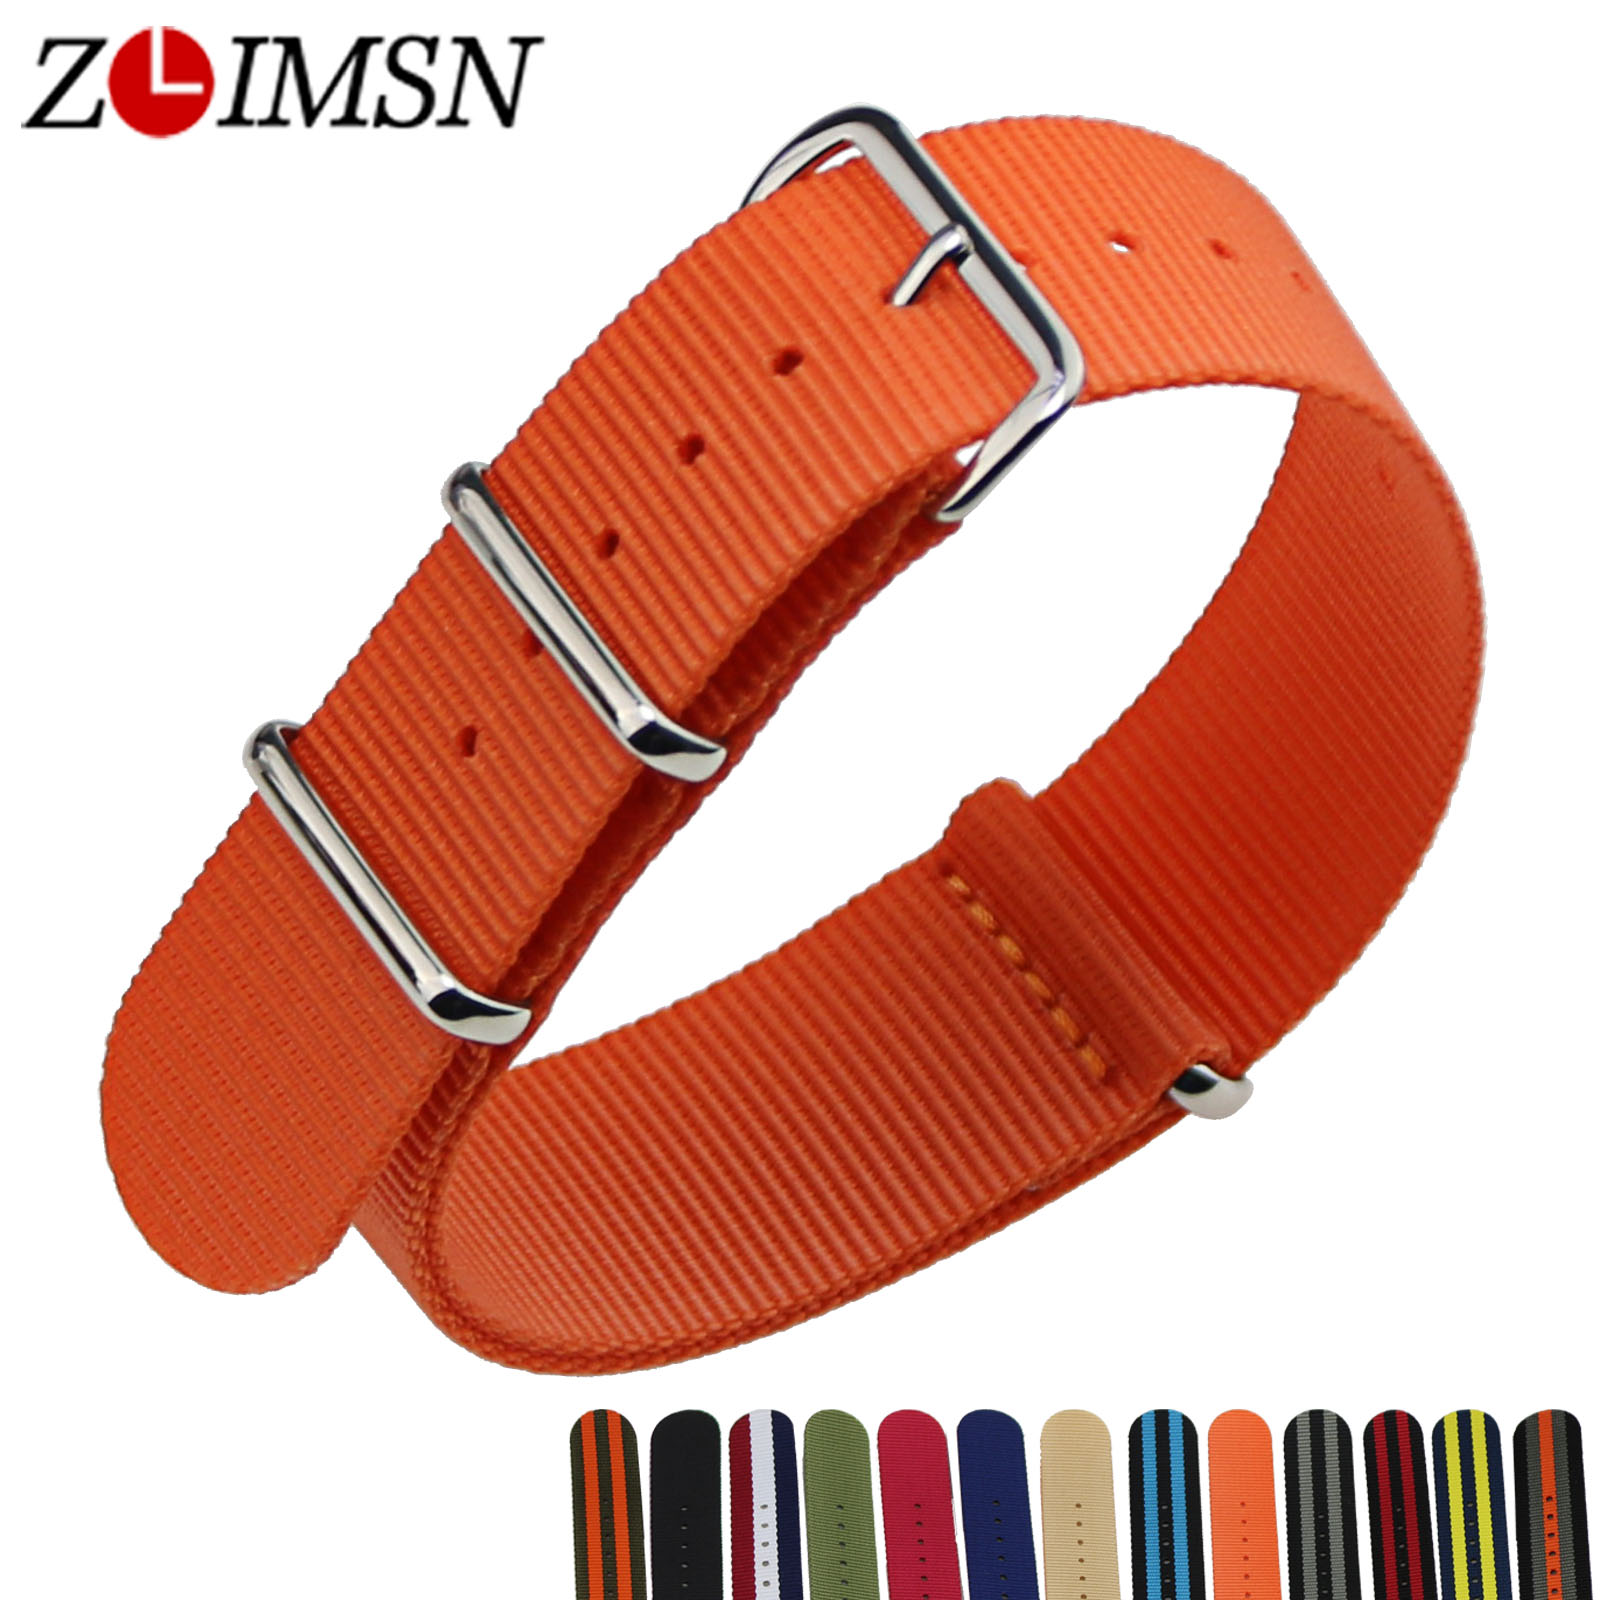 ZLIMSN 5pcs/lot Nato Nylon Strap Watchband Watch Belt Silver Metal Buckle Watches Accessories Relojes Hombre 2017 18 20 22 24mm